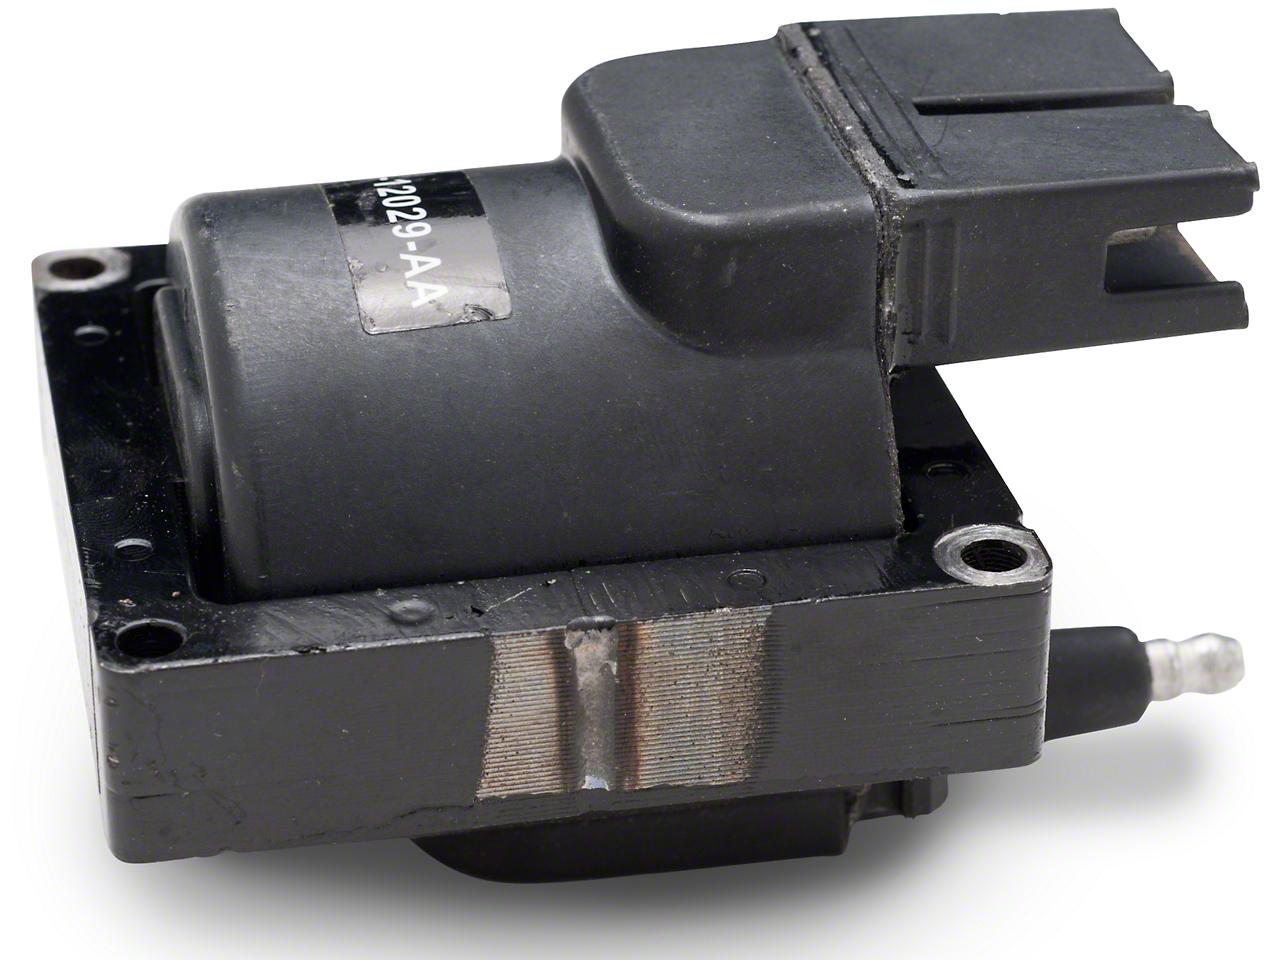 Ford Motorcraft Ignition Coil w/ EFI (83-95 5.0L)